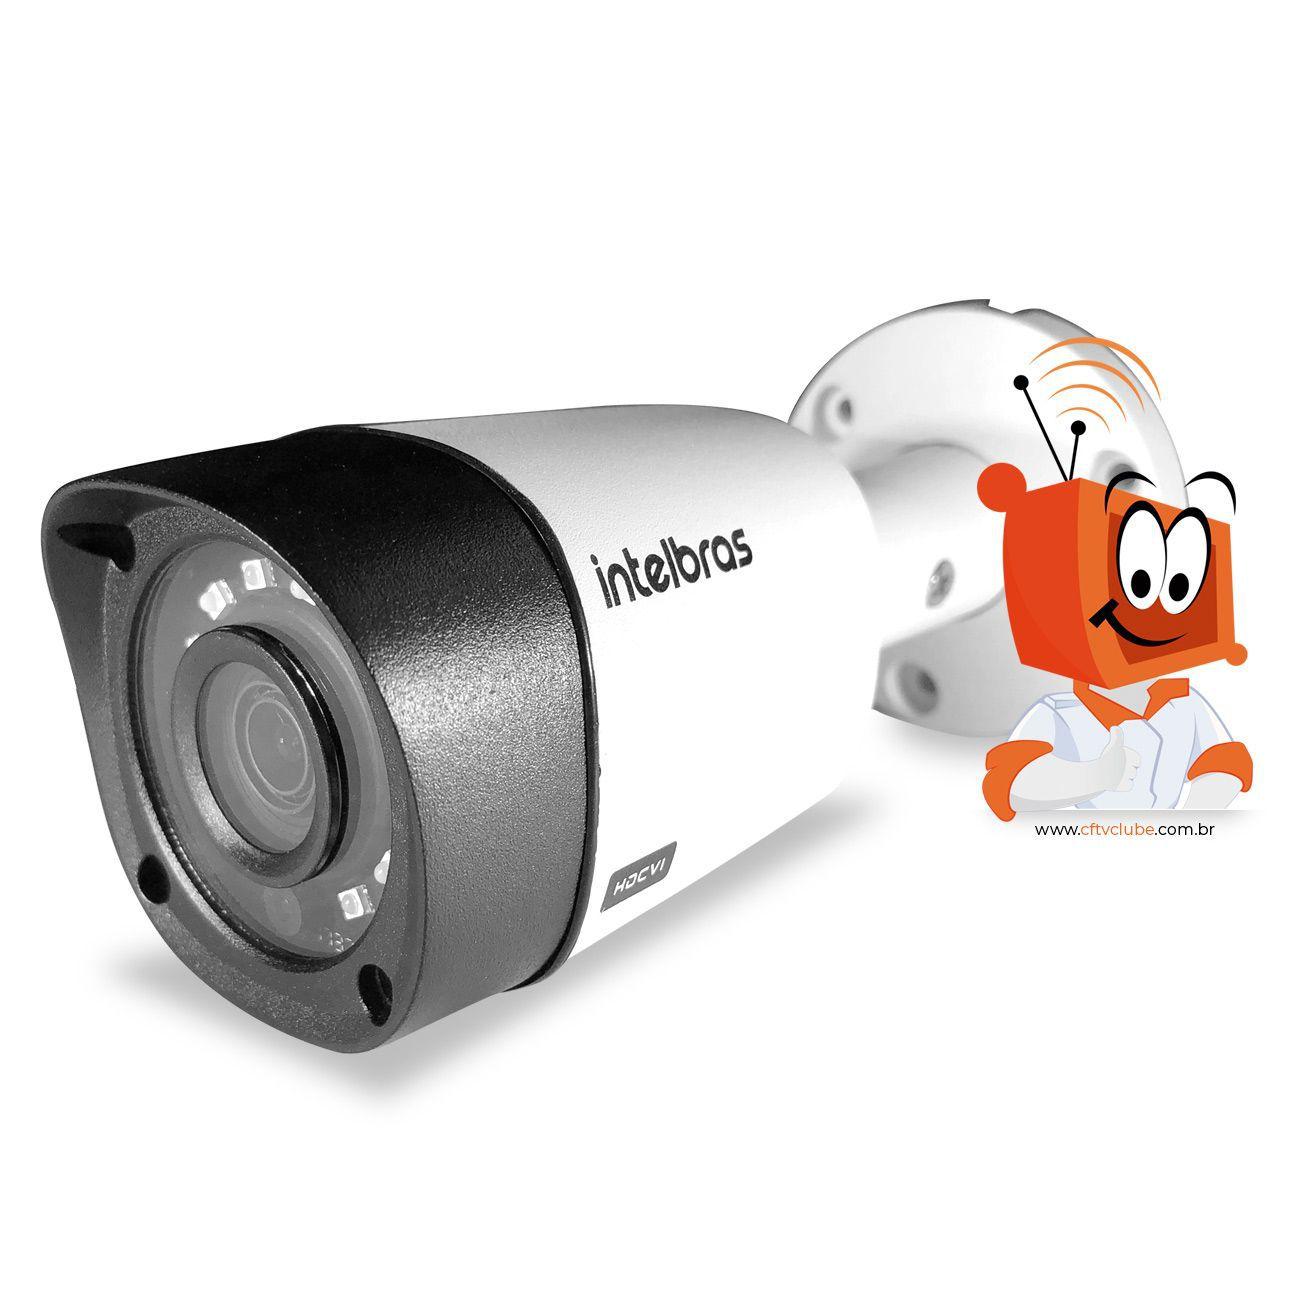 Mega Kit Essencial Intelbras Completo Alta definição 8 Câmeras - Resolução Máxima  - CFTV Clube   Brasil